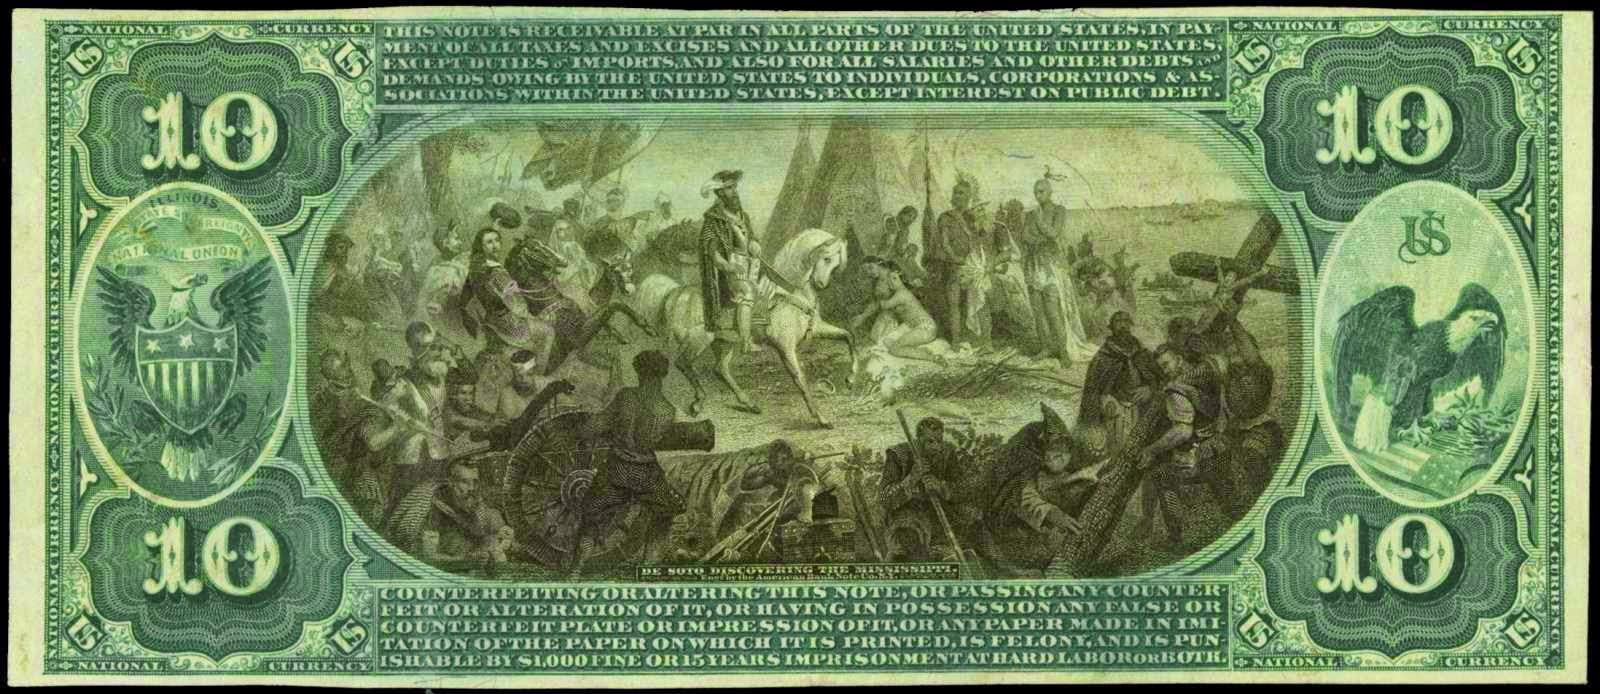 Ten Dollar Bill National Currency 1875